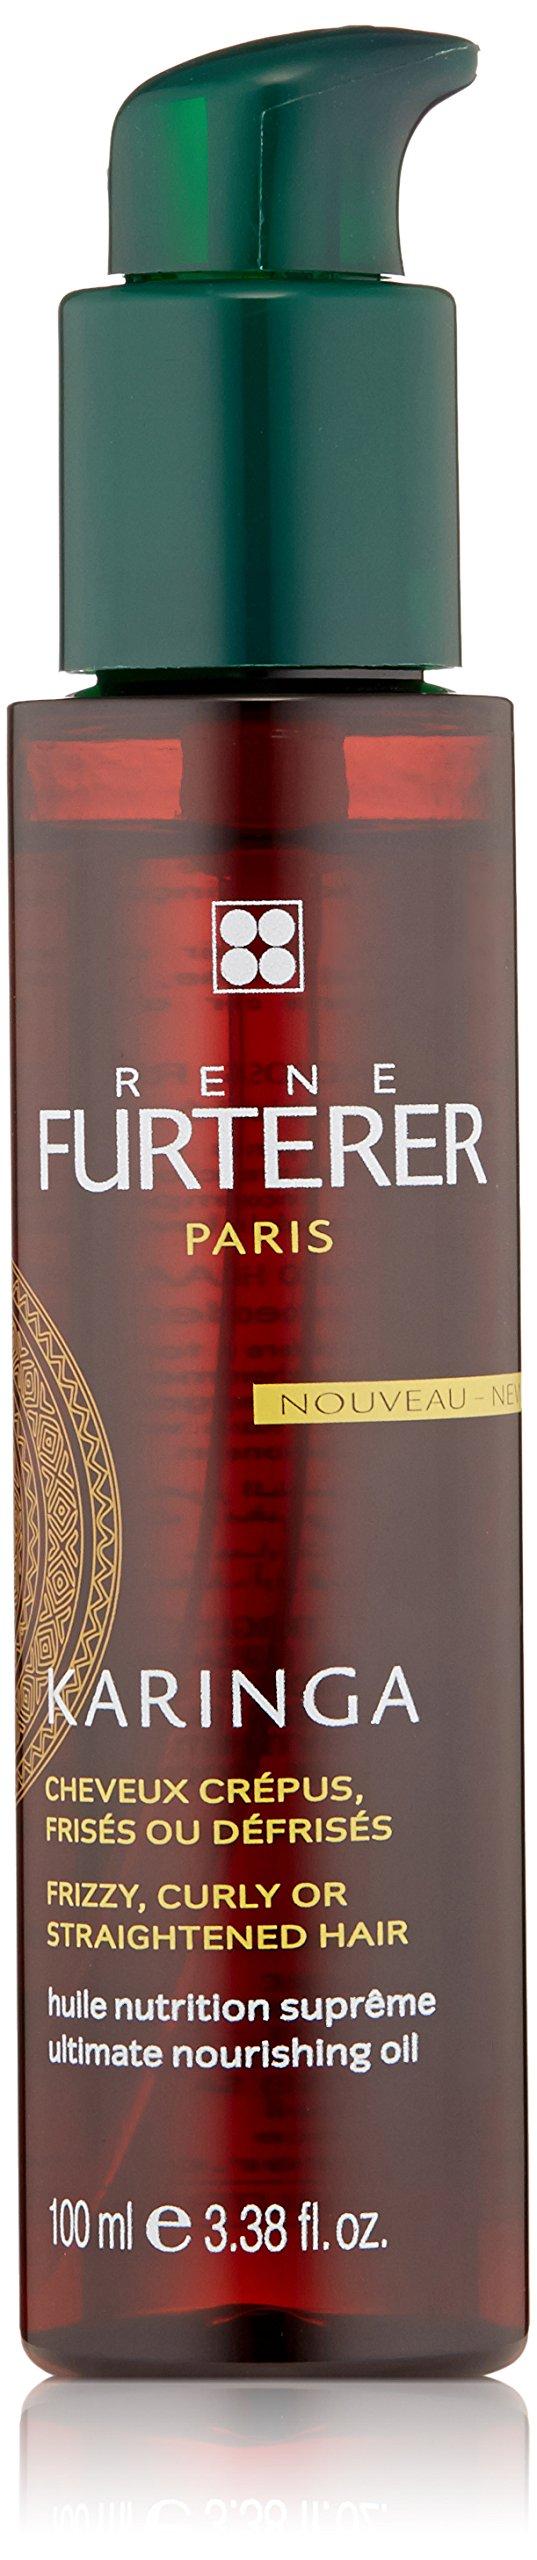 Rene Furterer KARINGA Ultimate Nourishing Oil, Frizzy, Coarse, Texture Hair, Shea Butter, Argan Oil, 3.3 oz.